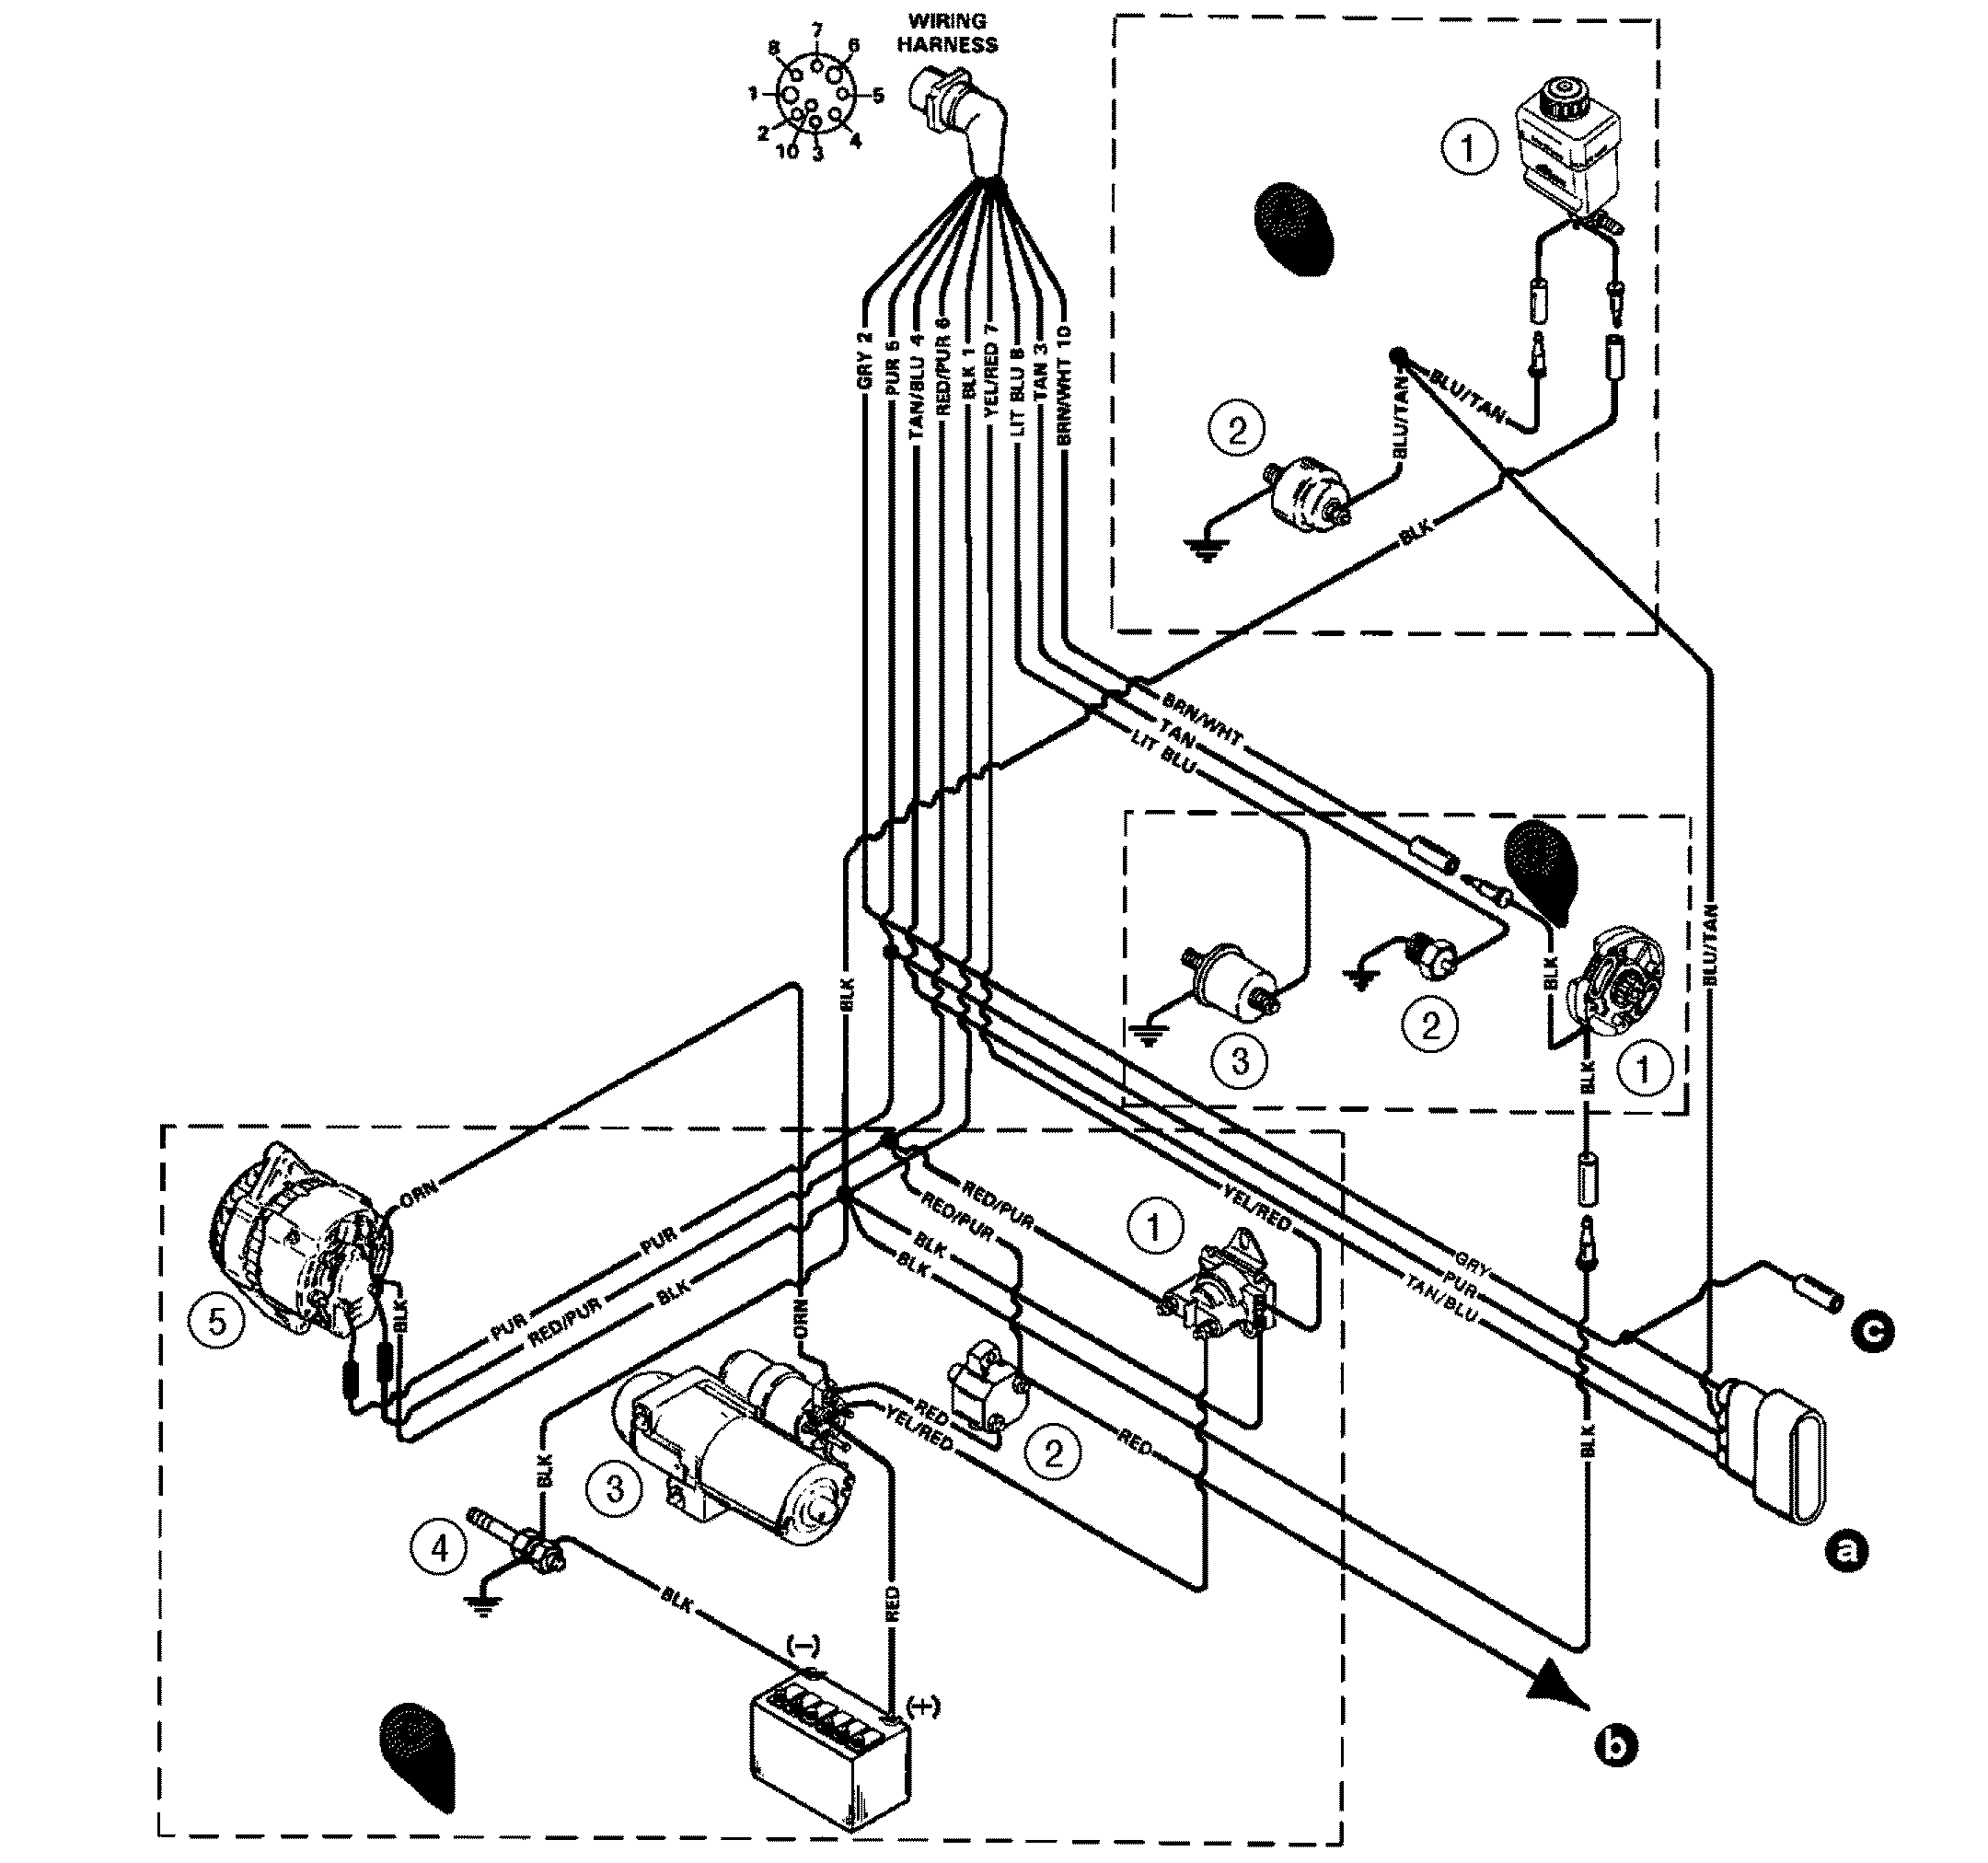 140 Hp Mercruiser Wire Diagram Trusted Wiring Diagram Mercruiser Trim  Sensor Wiring Diagram 160 Mercruiser Wiring Diagram